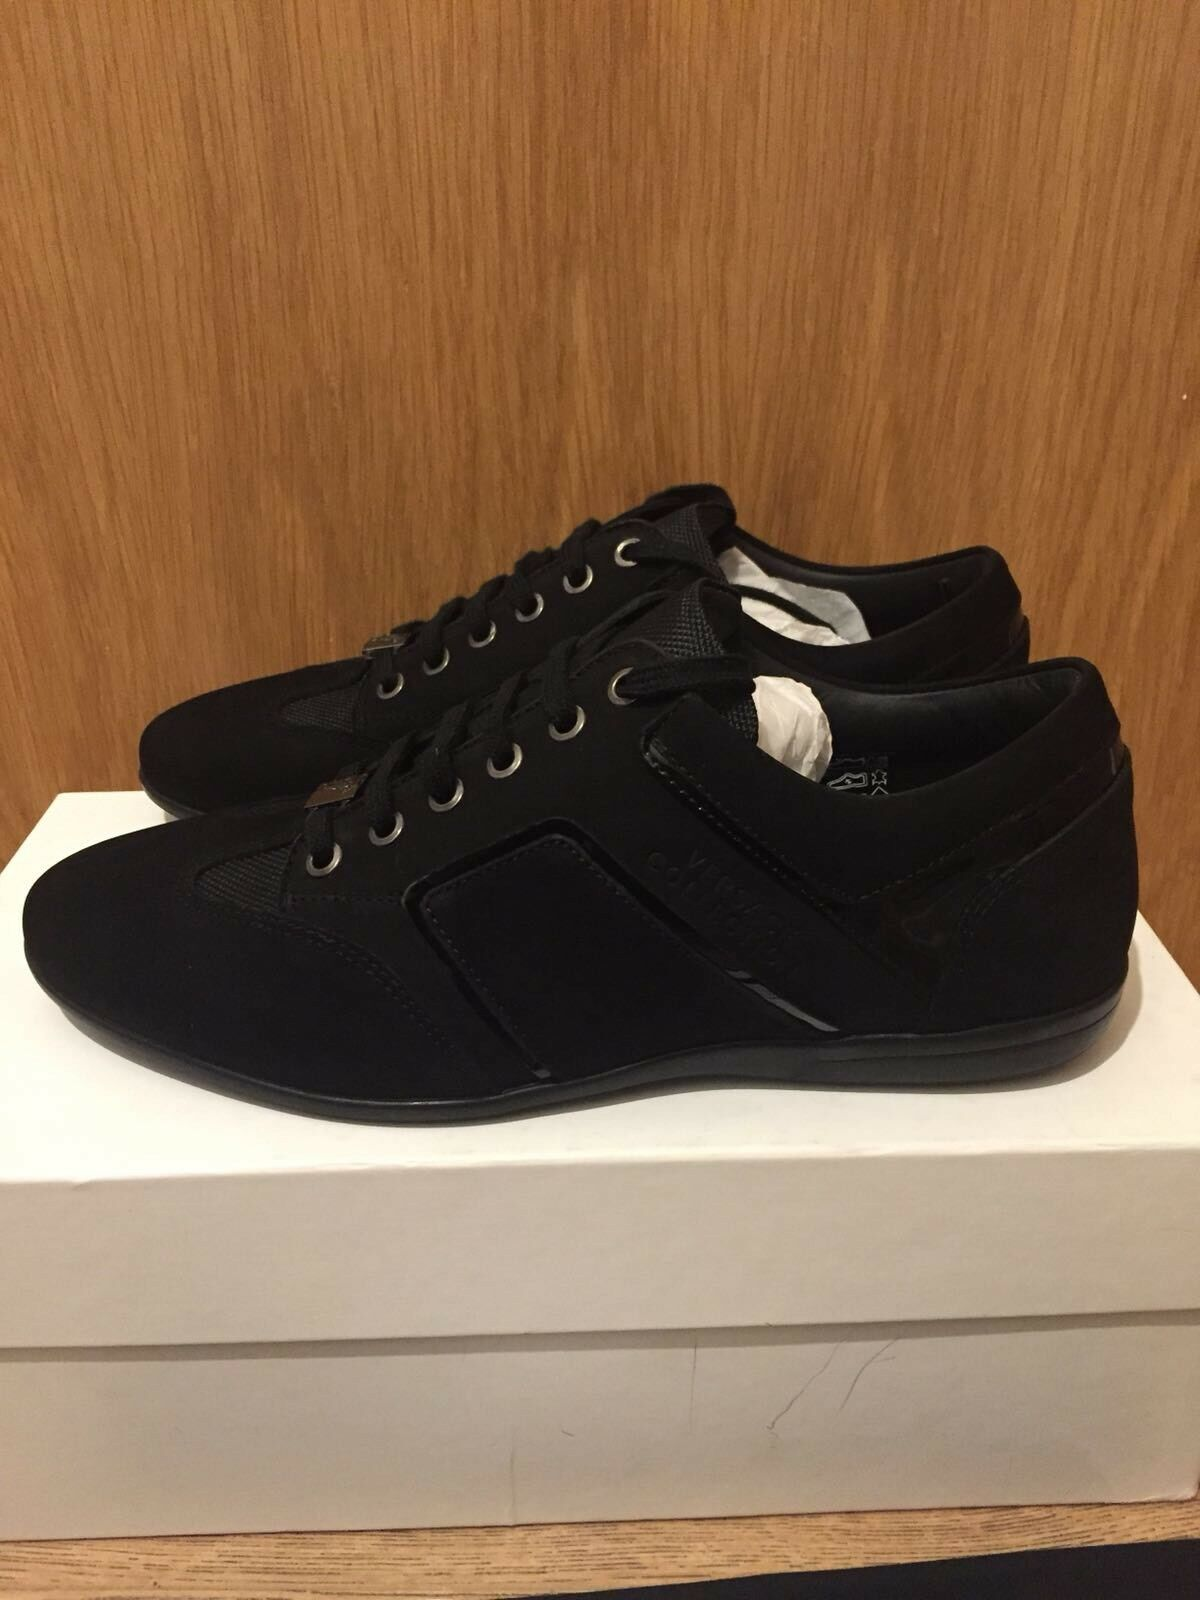 Versace Collection nera in pelle di nabuk Ritaglio Logo Tg Tg Tg  EU 41 a960d5